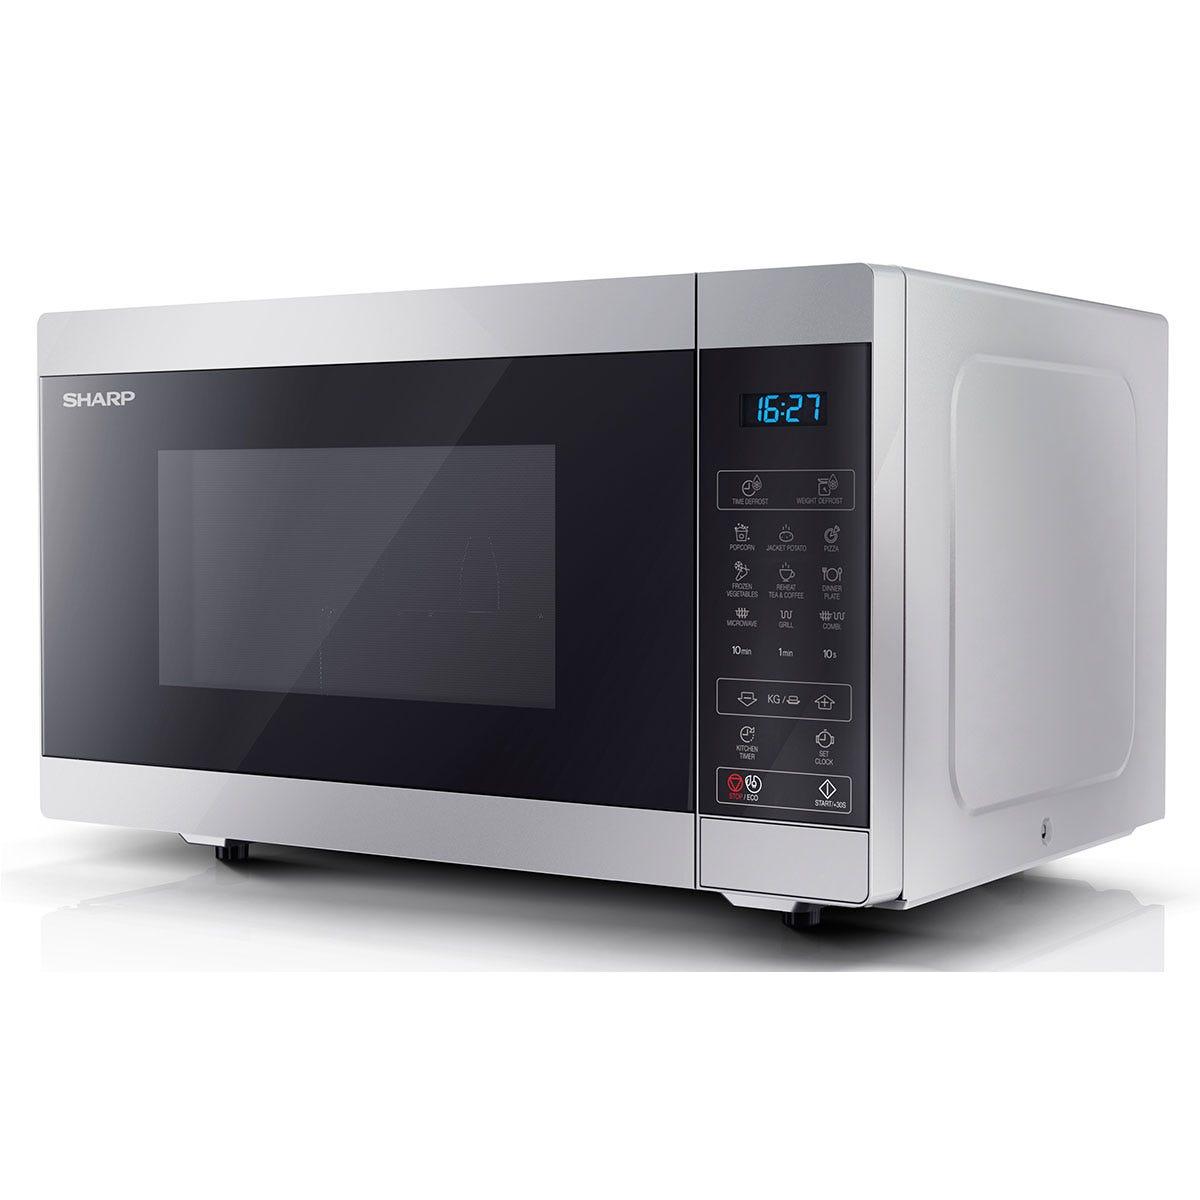 Sharp YC-MG51U-S 900W Digital Touch Control 25L Microwave with 1000W Grill - Silver